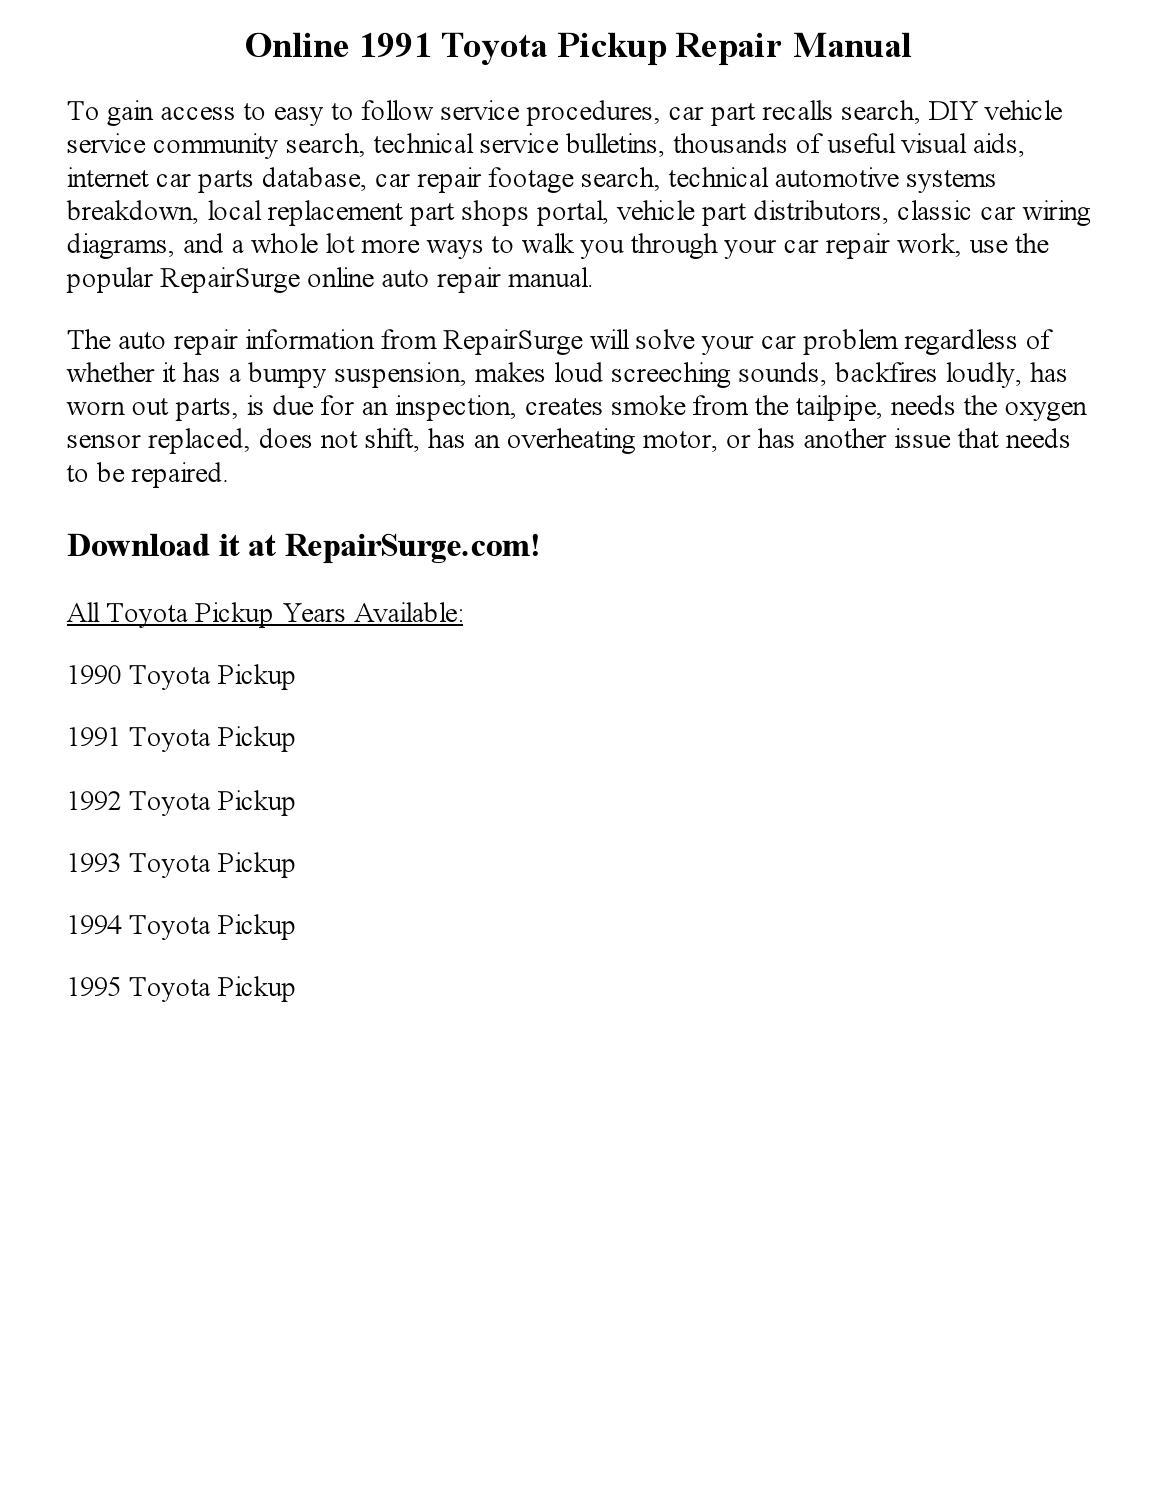 1991 toyota pickup repair manual online by Precious Pim - issuu on